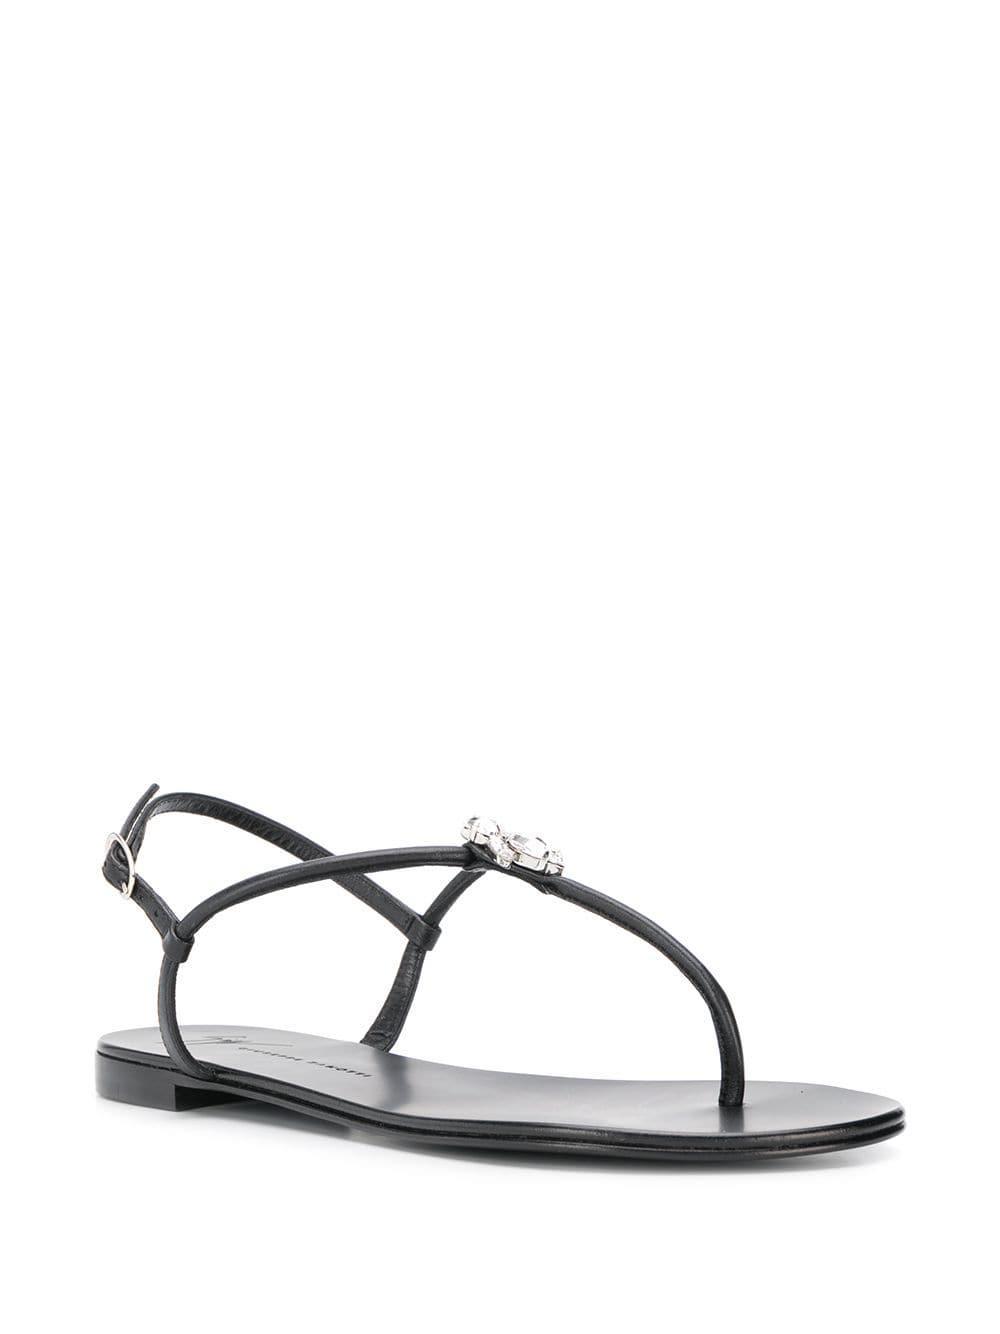 6bb69bb17124 Giuseppe Zanotti Anya Love Sandals in Black - Lyst